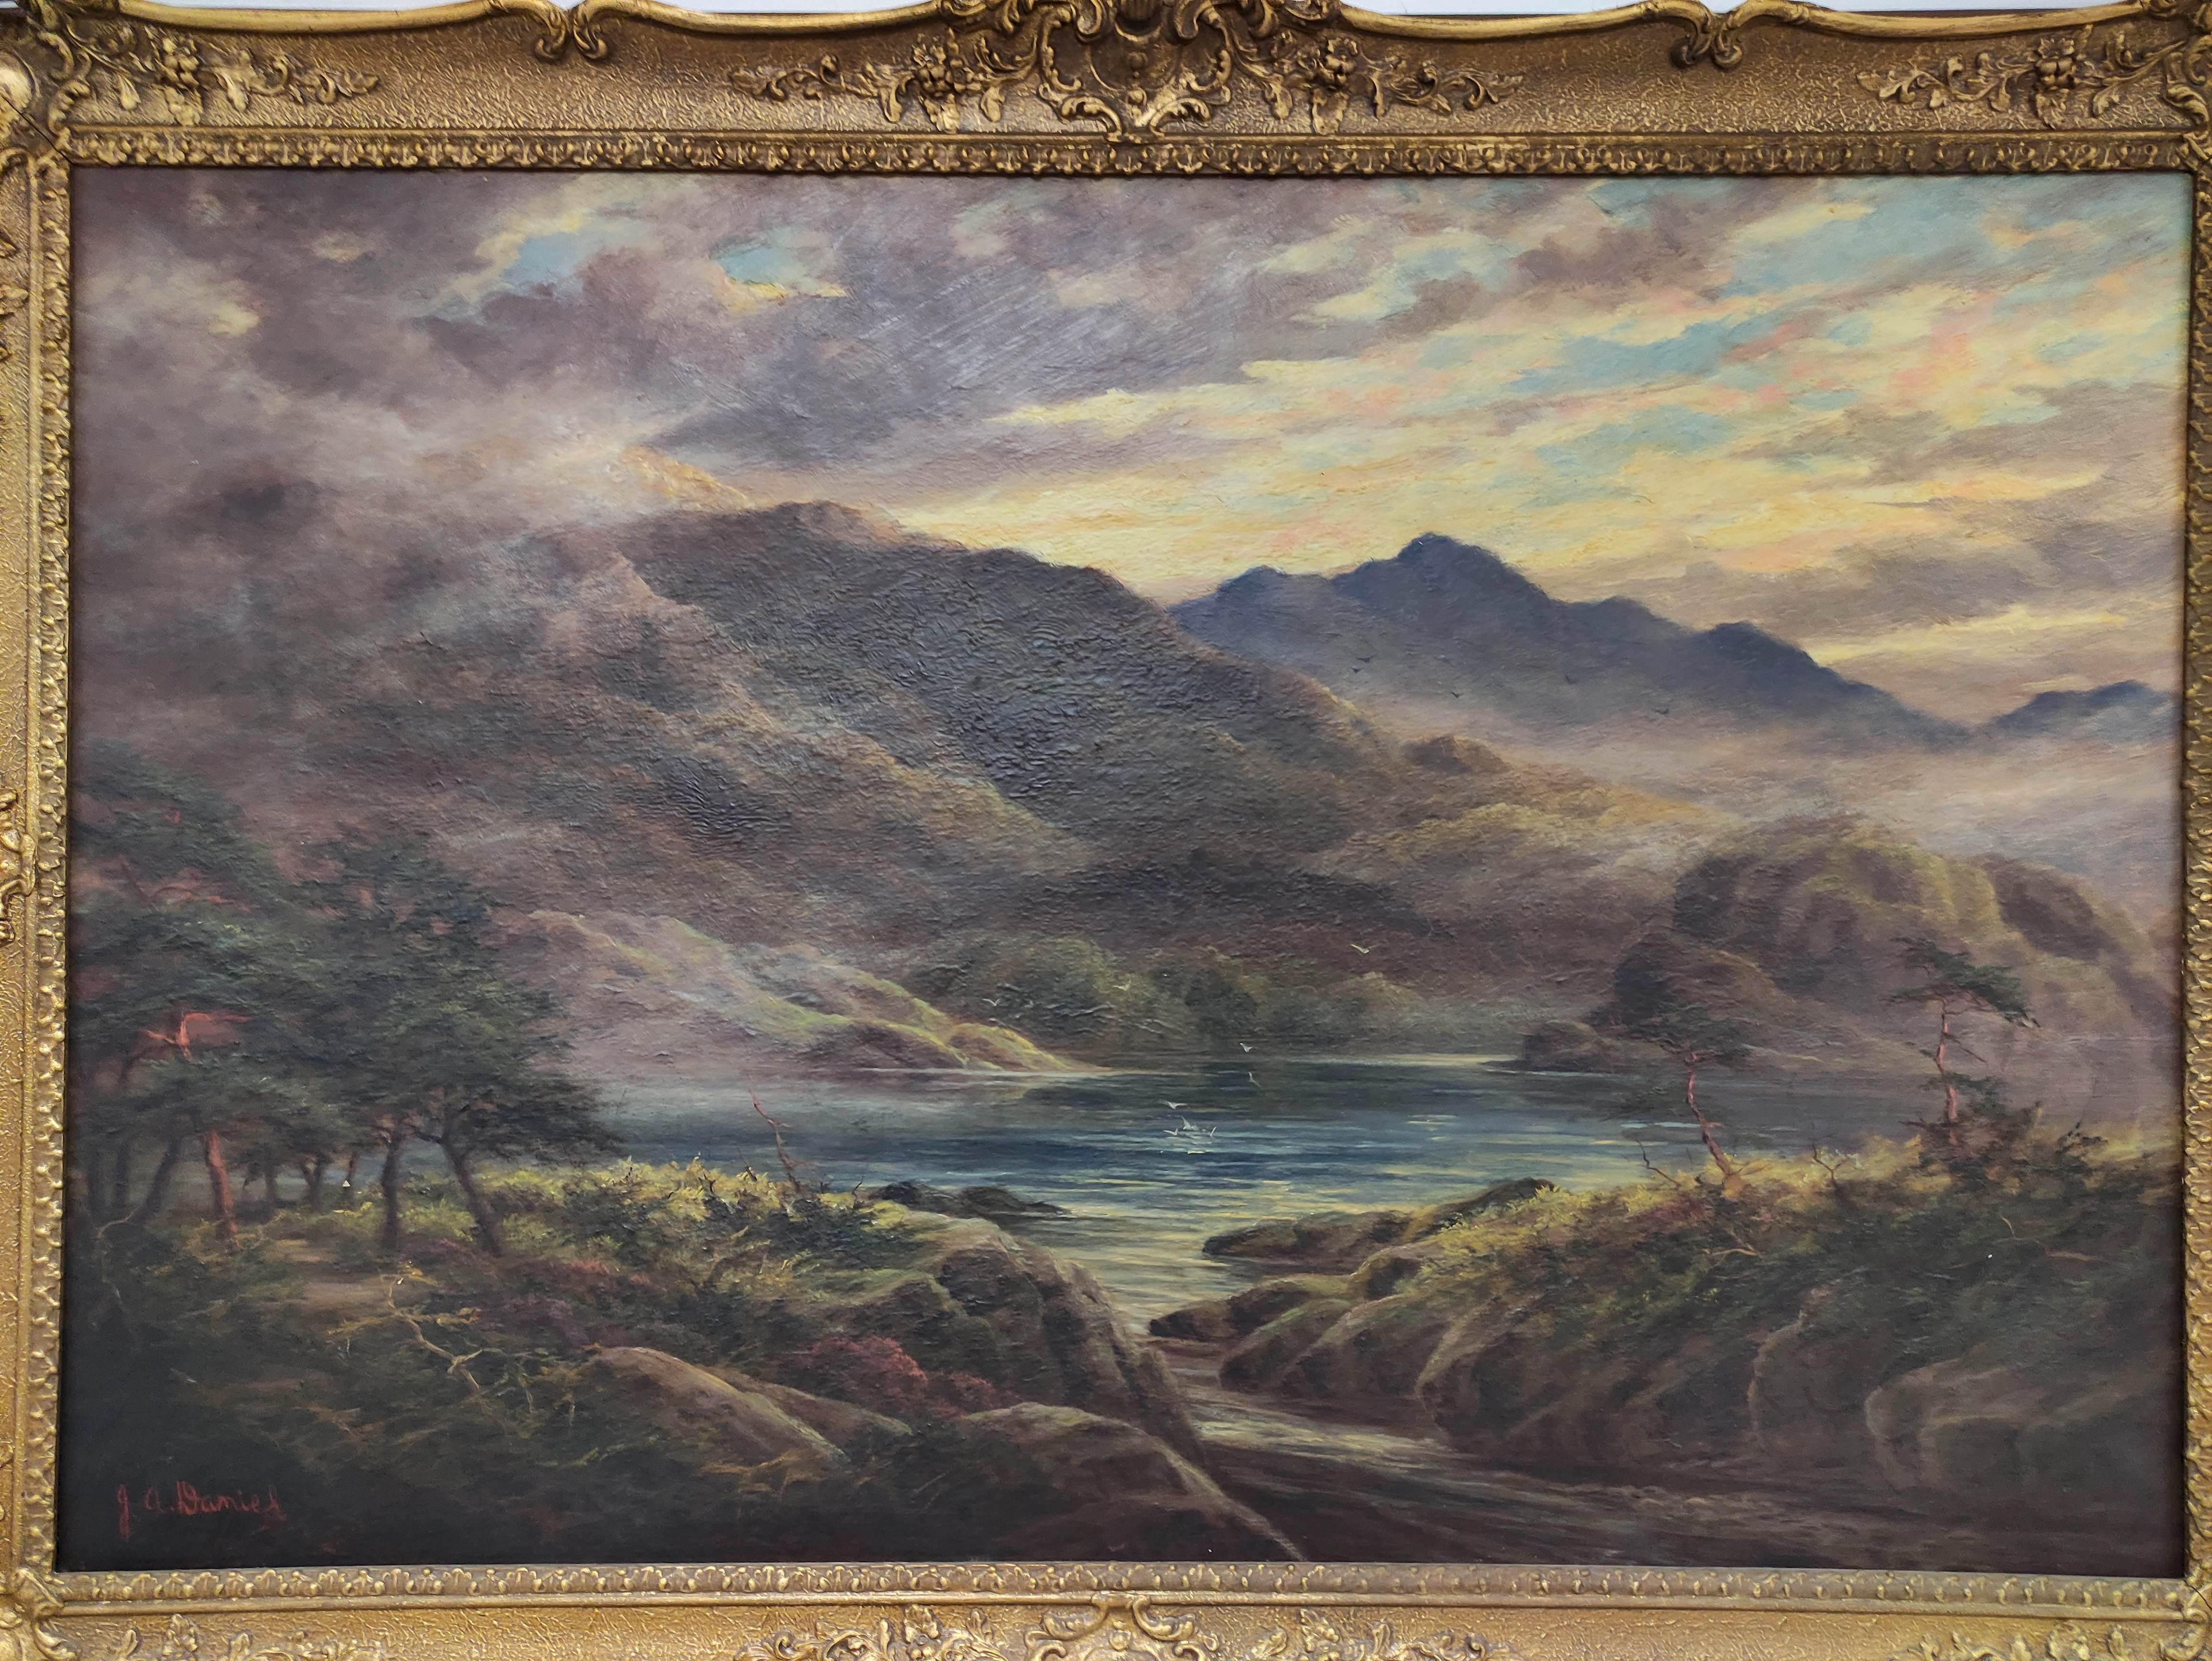 J. A. DANIEL. Loch Aylort. Signed, oil on canvas. 60cm x 90cm. - Image 3 of 3